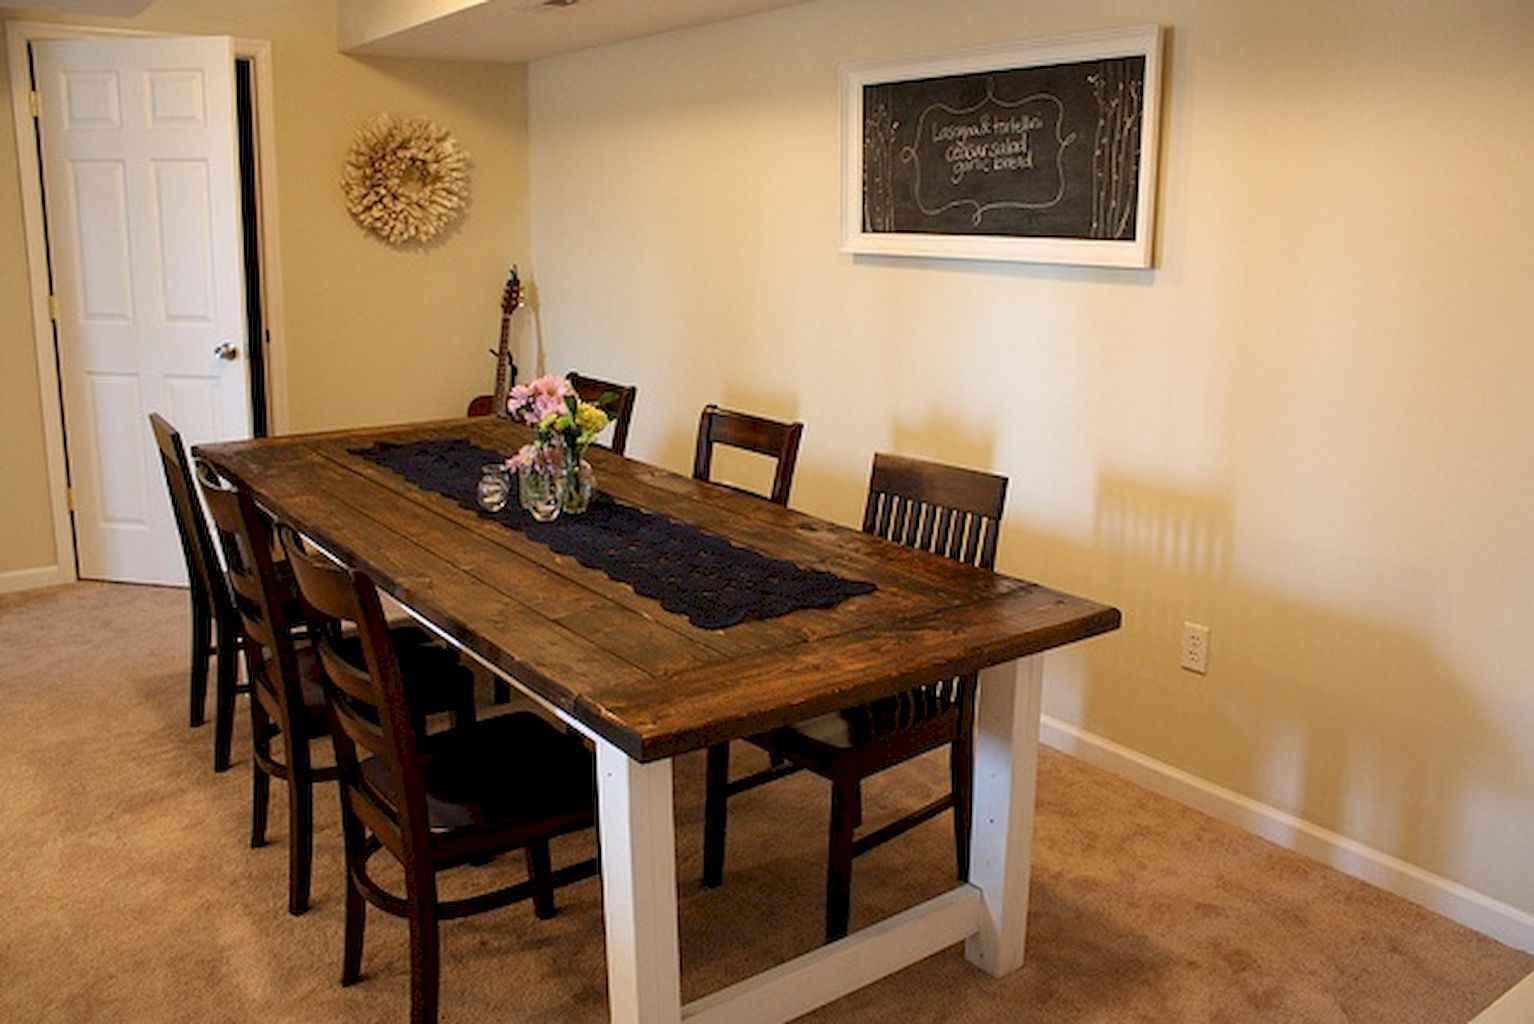 100 Rustic Farmhouse Dining Room Decor Ideas (44)